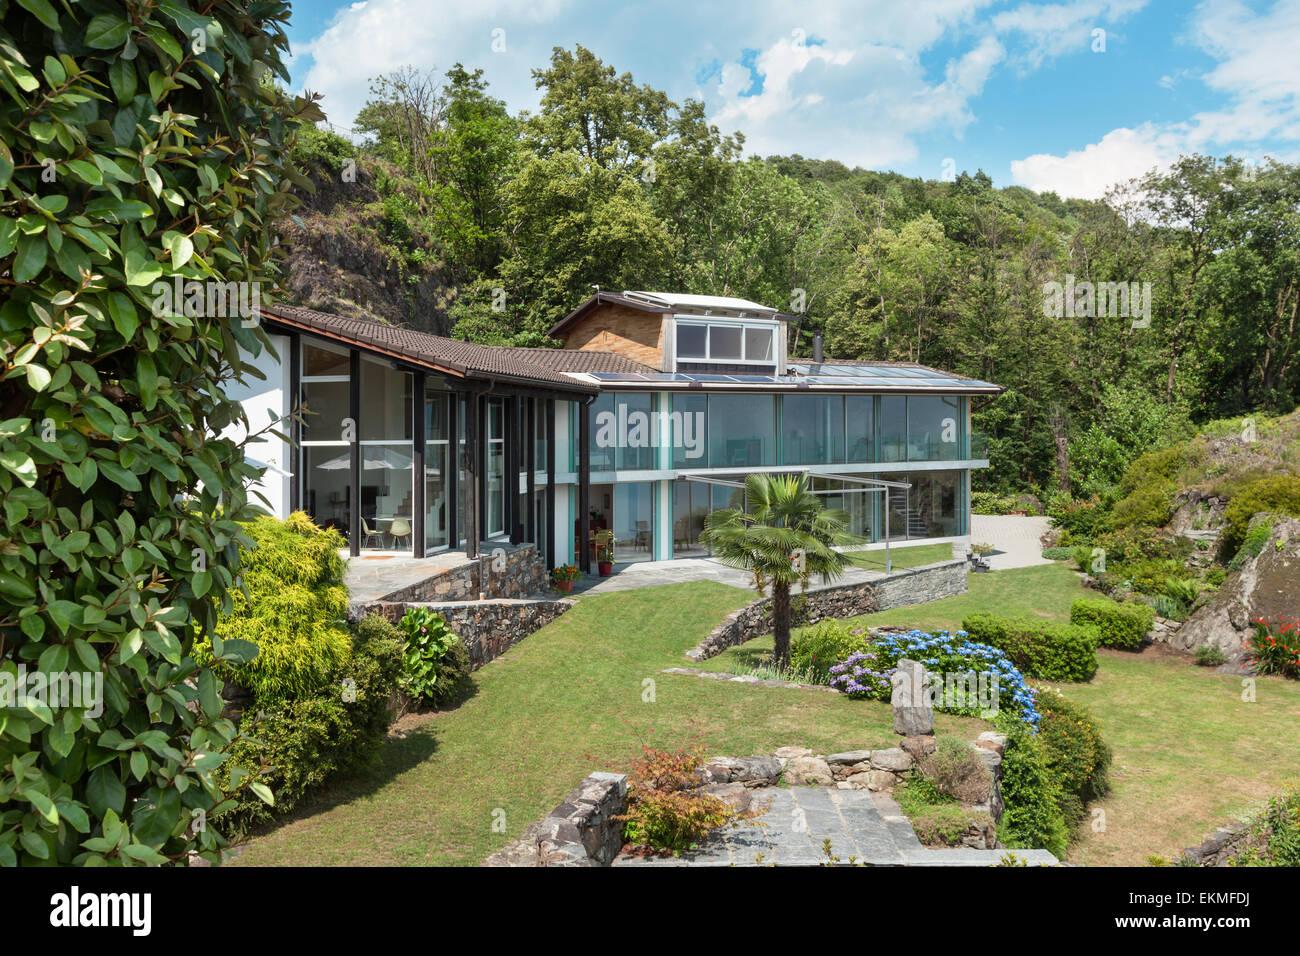 Casa di montagna architettura moderna per esterno foto for Architettura casa moderna